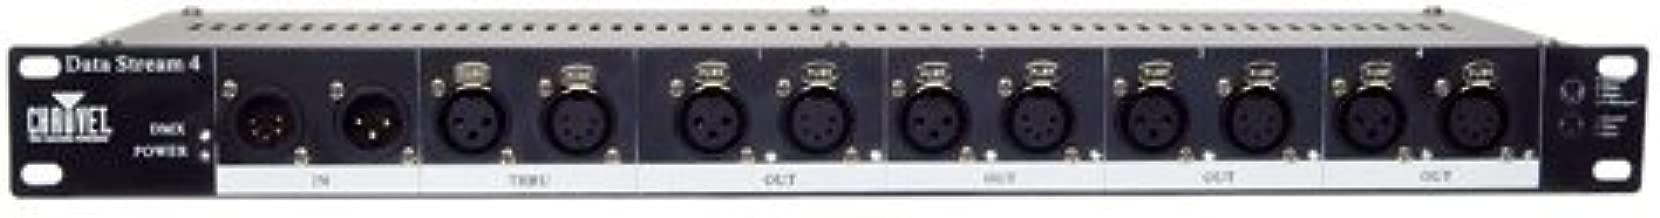 CHAUVET DJ Data Stream 4 Universal DMX-512 Optical Splitter w/4 Outputs from Single Input